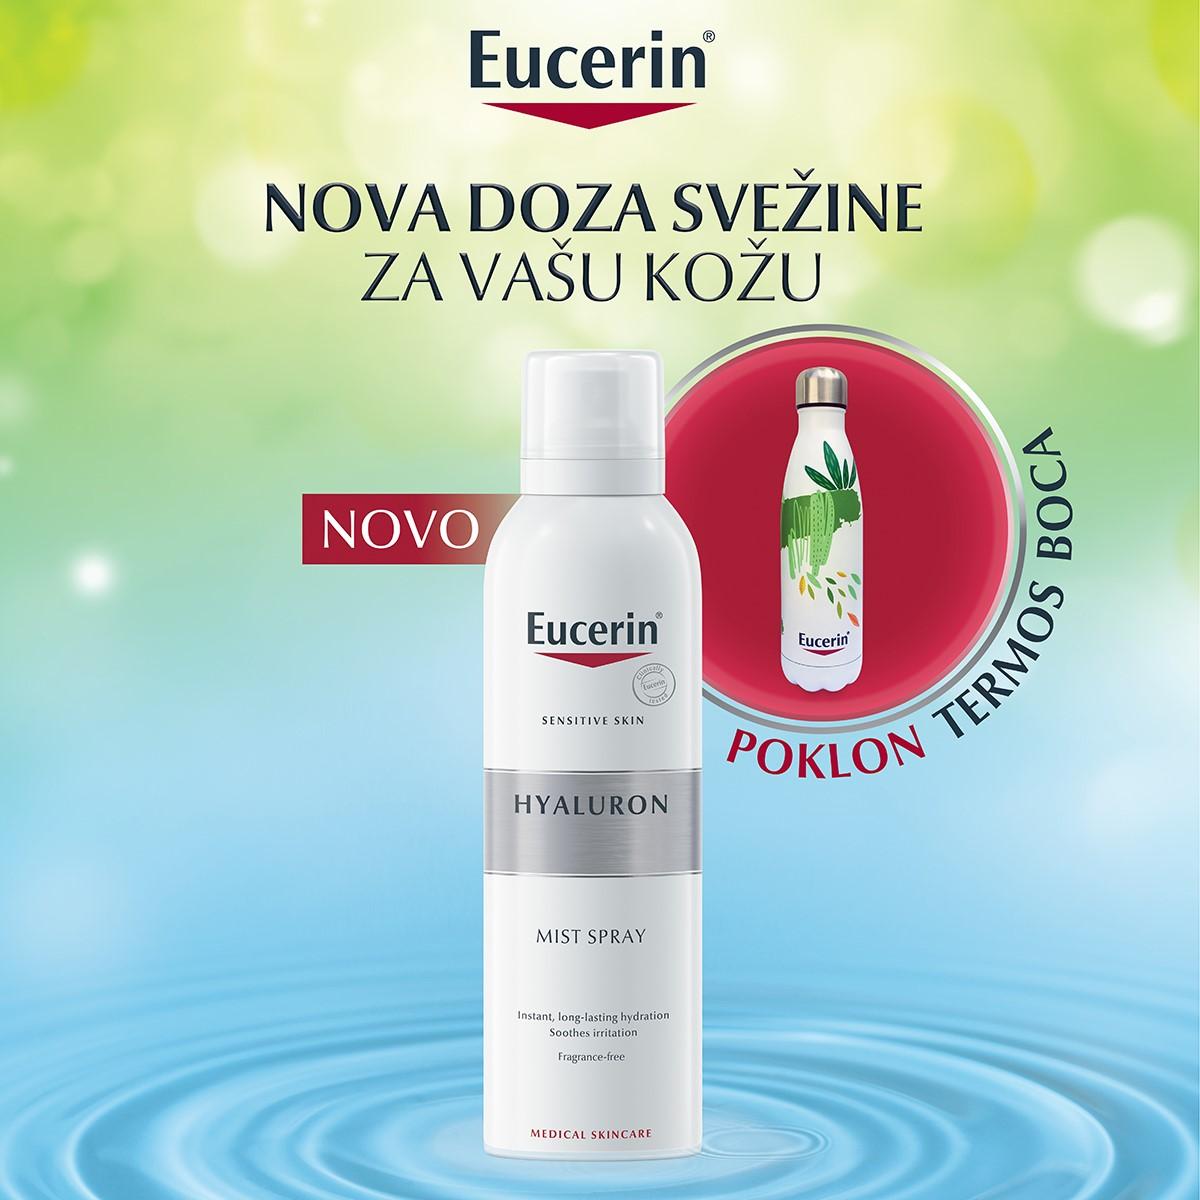 Letnje osveženje za vas i vašu kožu